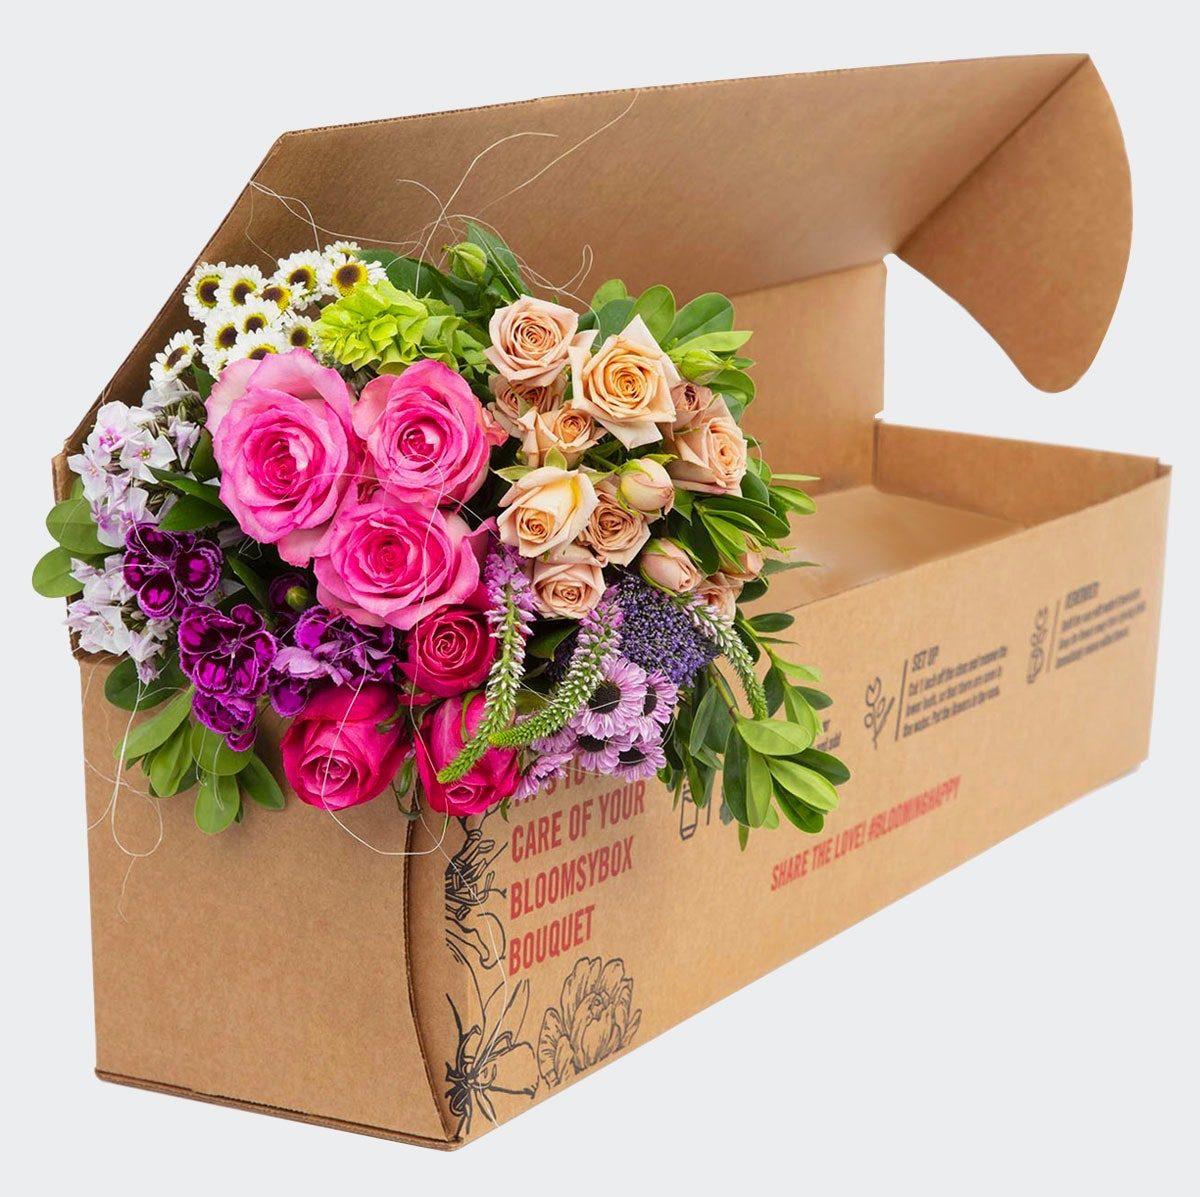 Bloomsybox send flowers